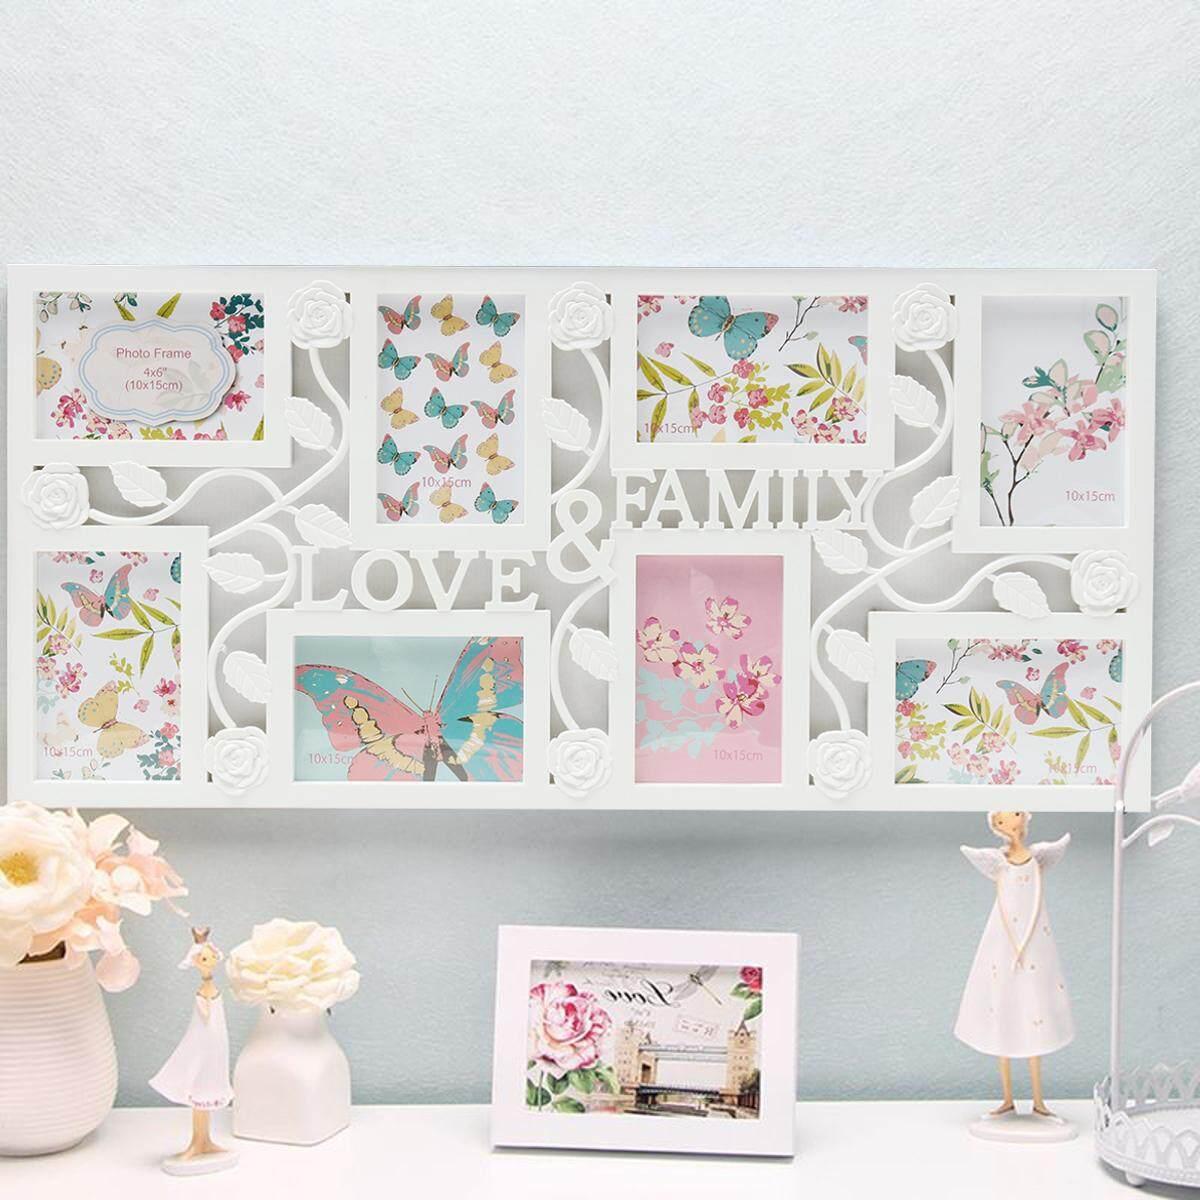 Multi Photoframe Frames Love Family Picture Wall Decor Photo Frame Gift - intl